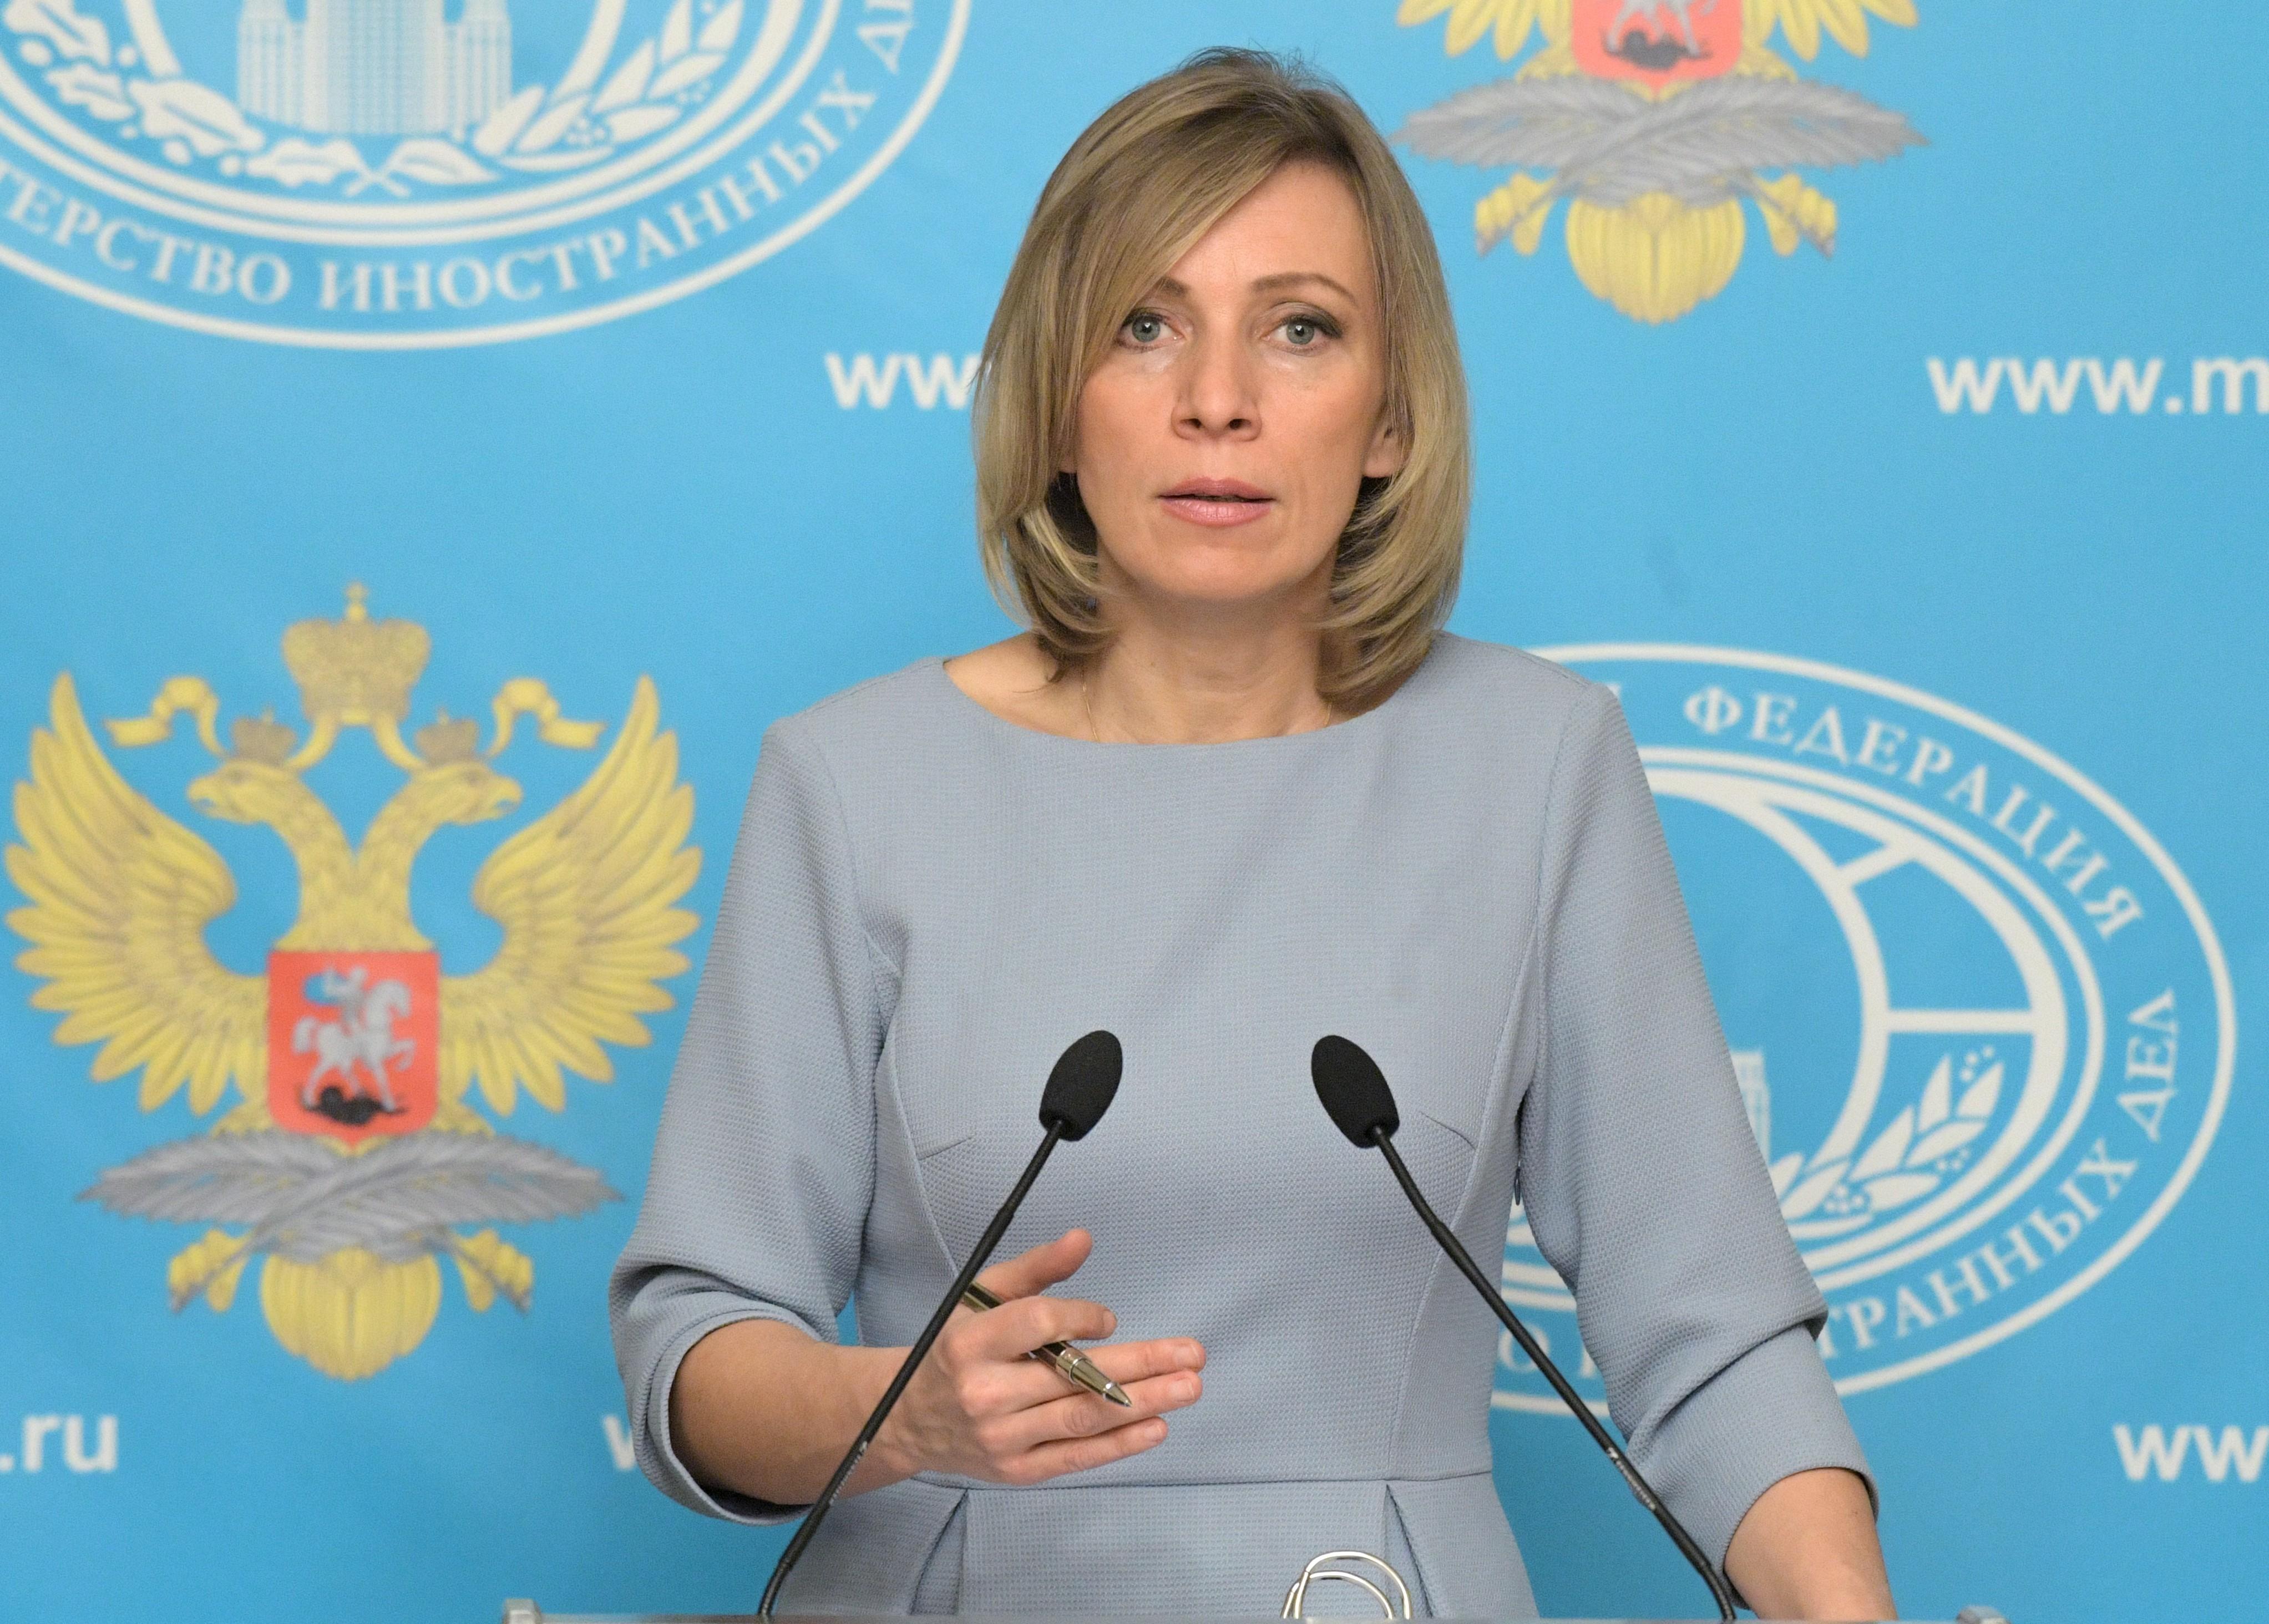 <p>Фото:<span>&copy;РИА Новости/Владимир Сысоев</span></p>